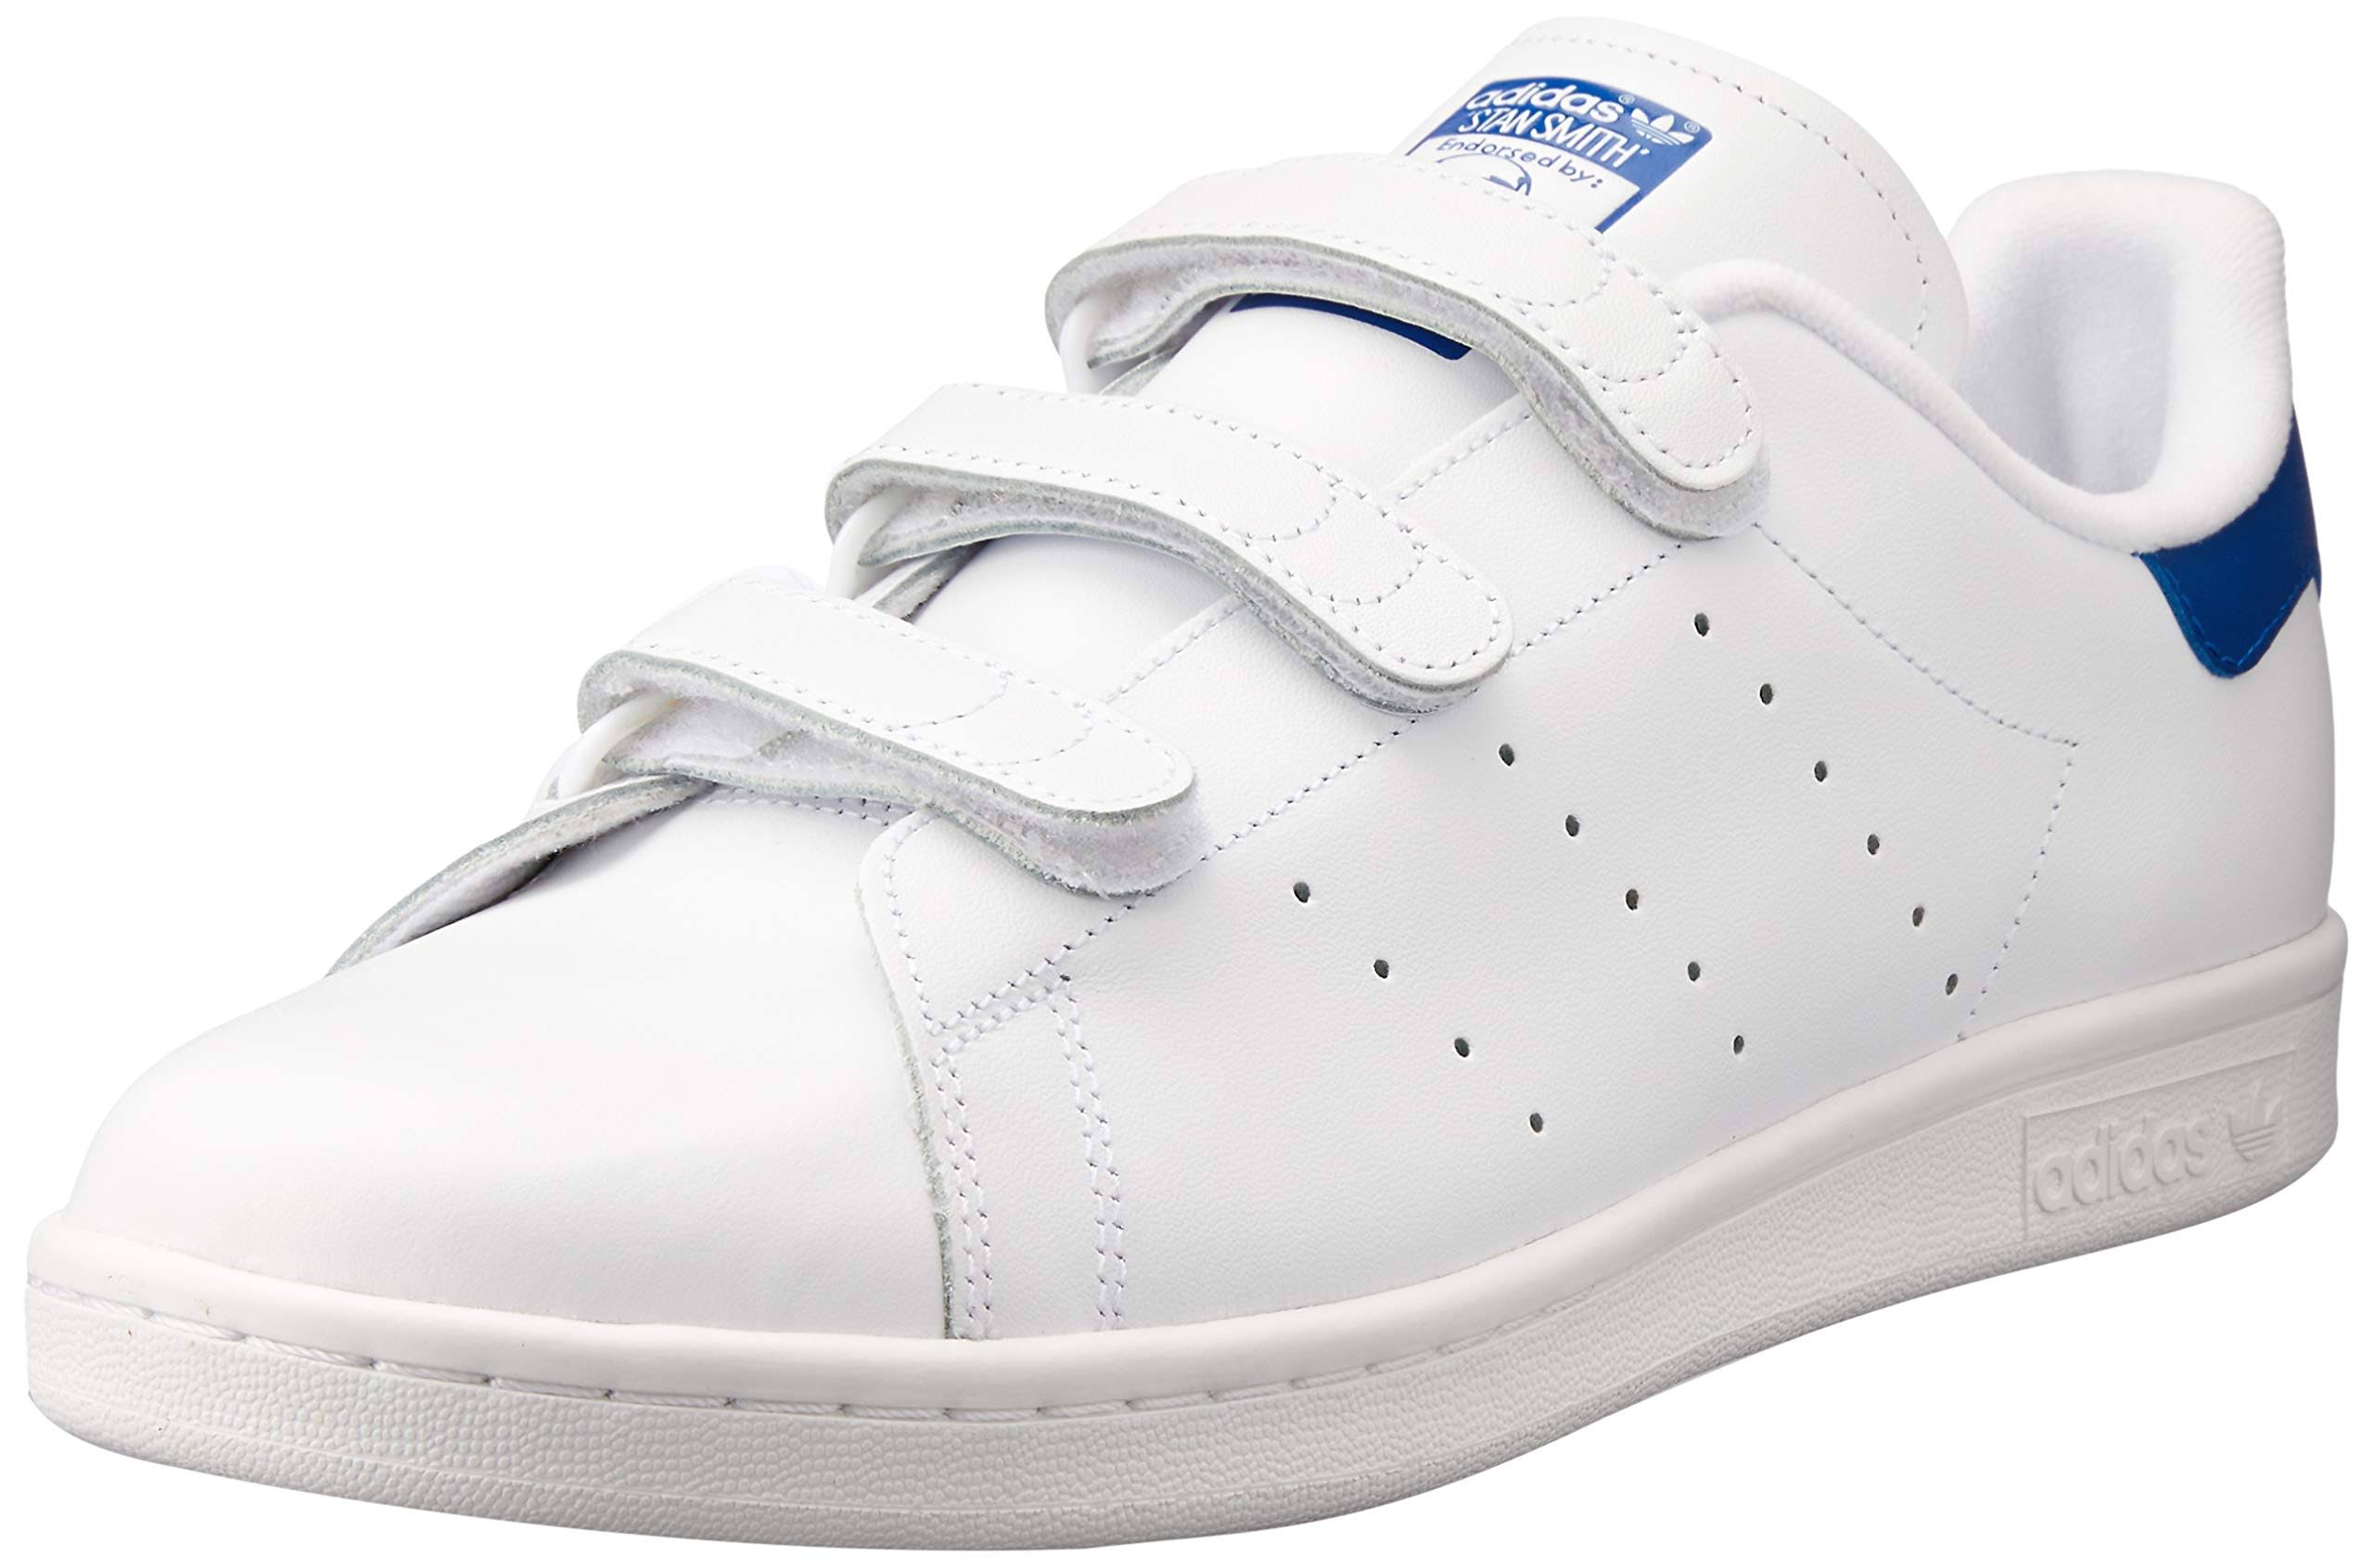 Adidas Originals Stan Smith Trainers White